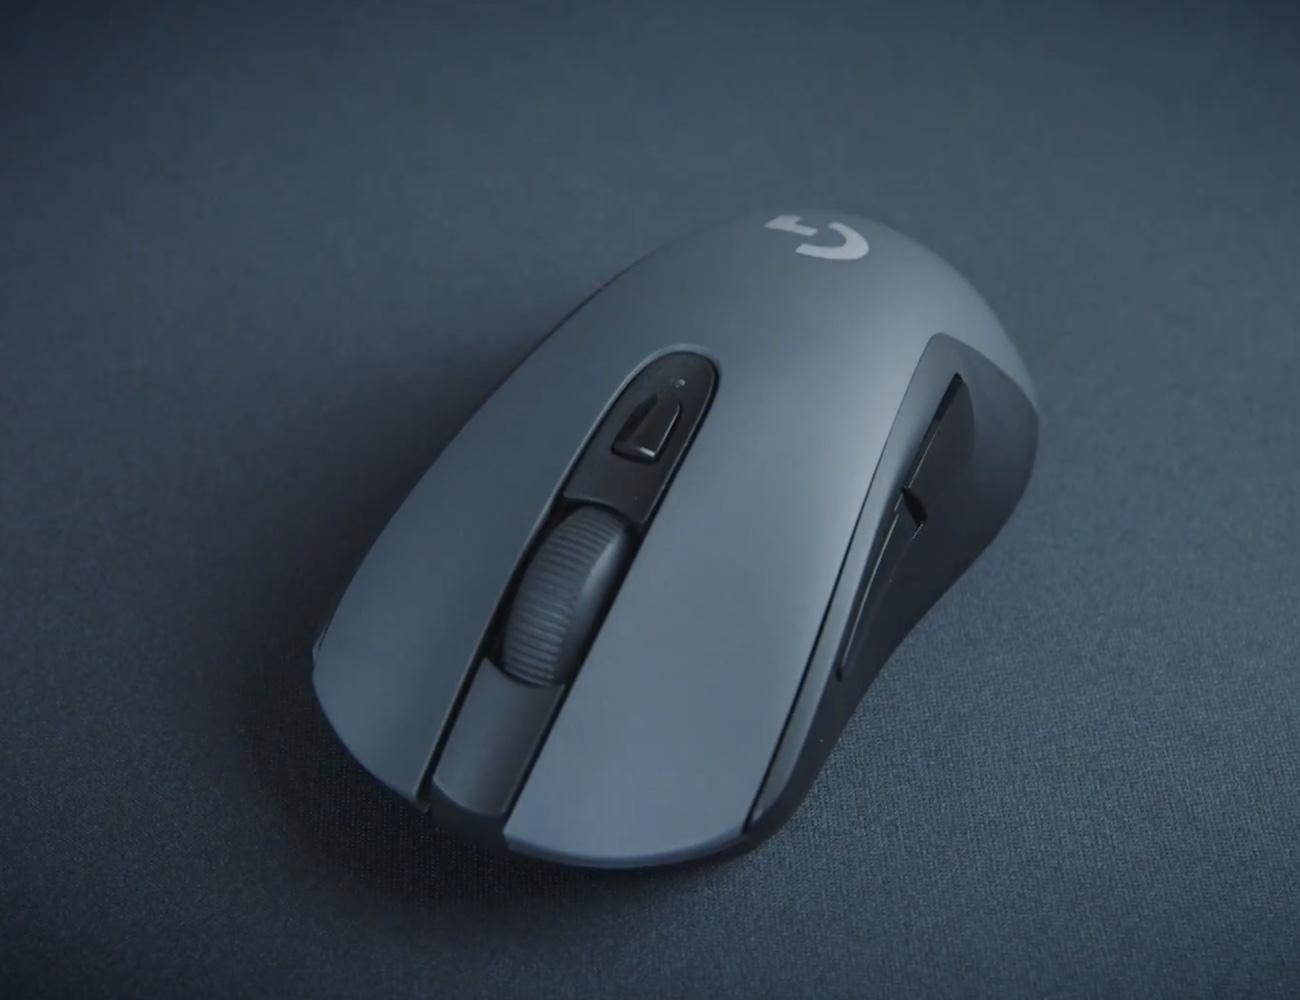 Logitech G603 Lightspeed Gaming Mouse